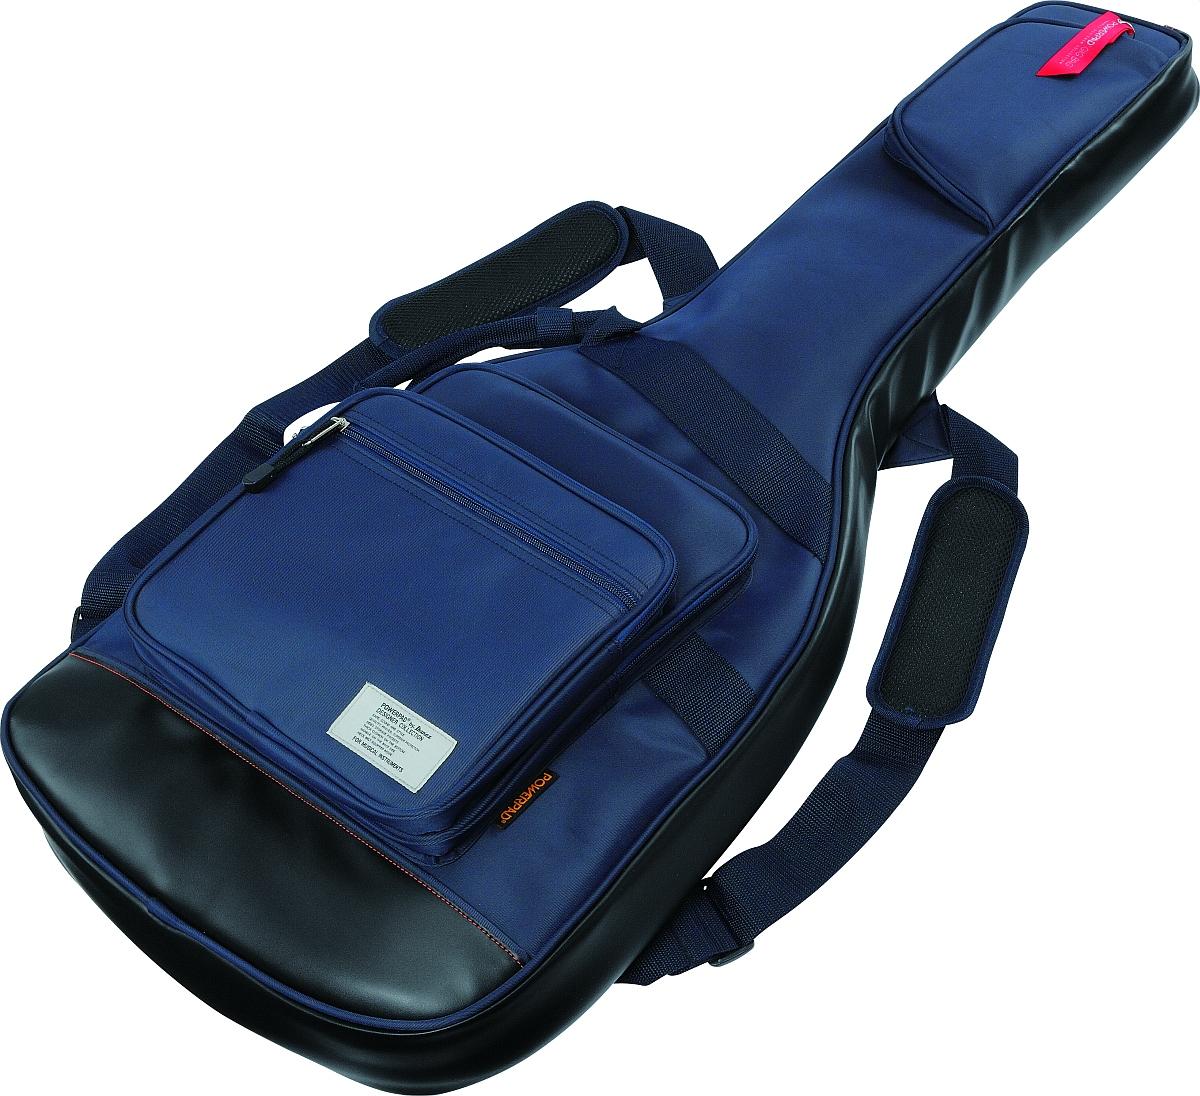 IBANEZ POWERPAD® IGB 561 Gigbag E-Gitarre Navy Blue